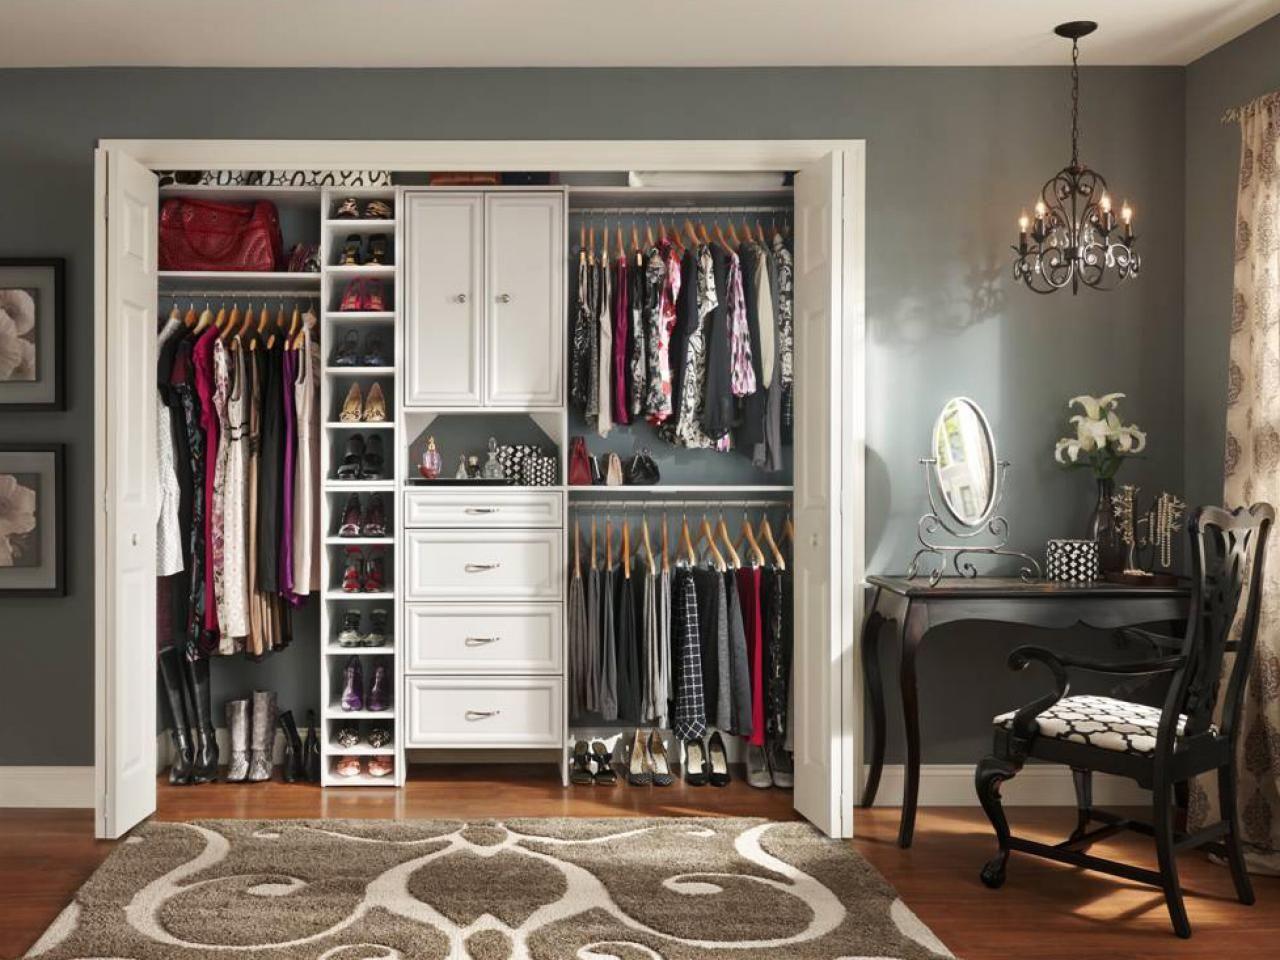 Pin de Keri Covey en Bedrooms | Pinterest